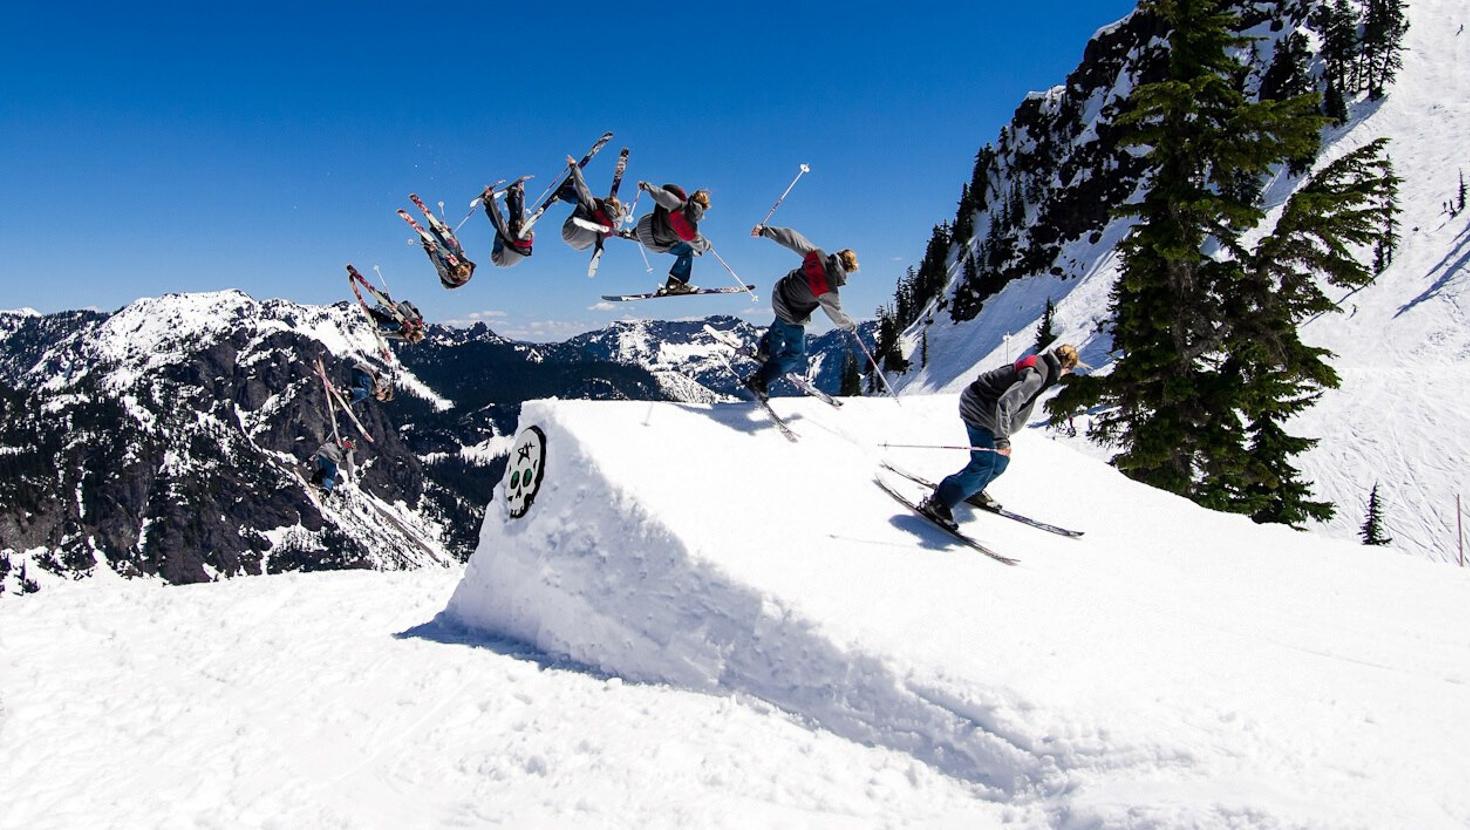 Garrett skiing. photo by Alexander murzikov.